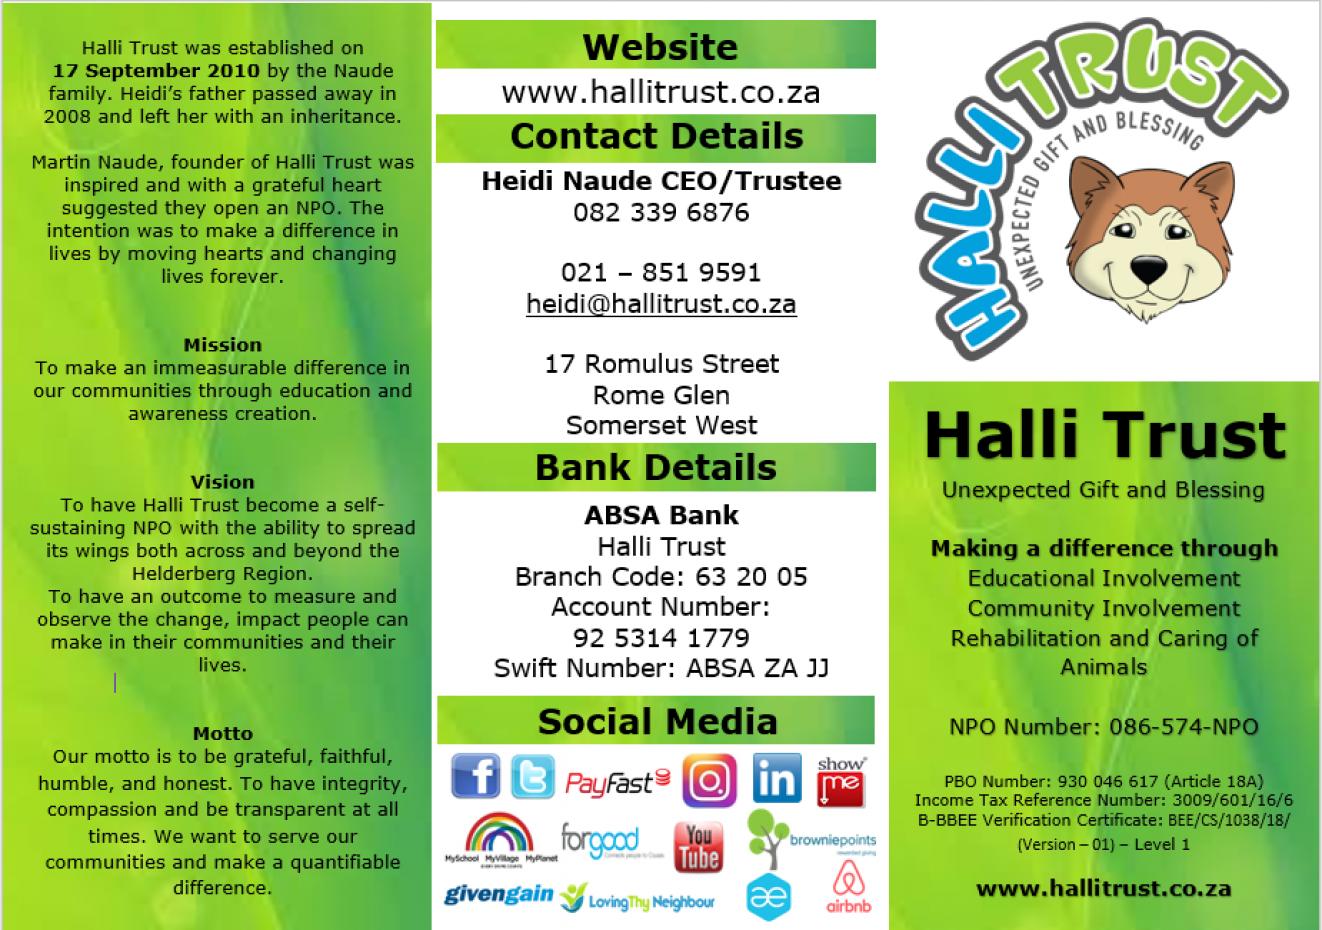 Halli Trust Information Pamplet 1